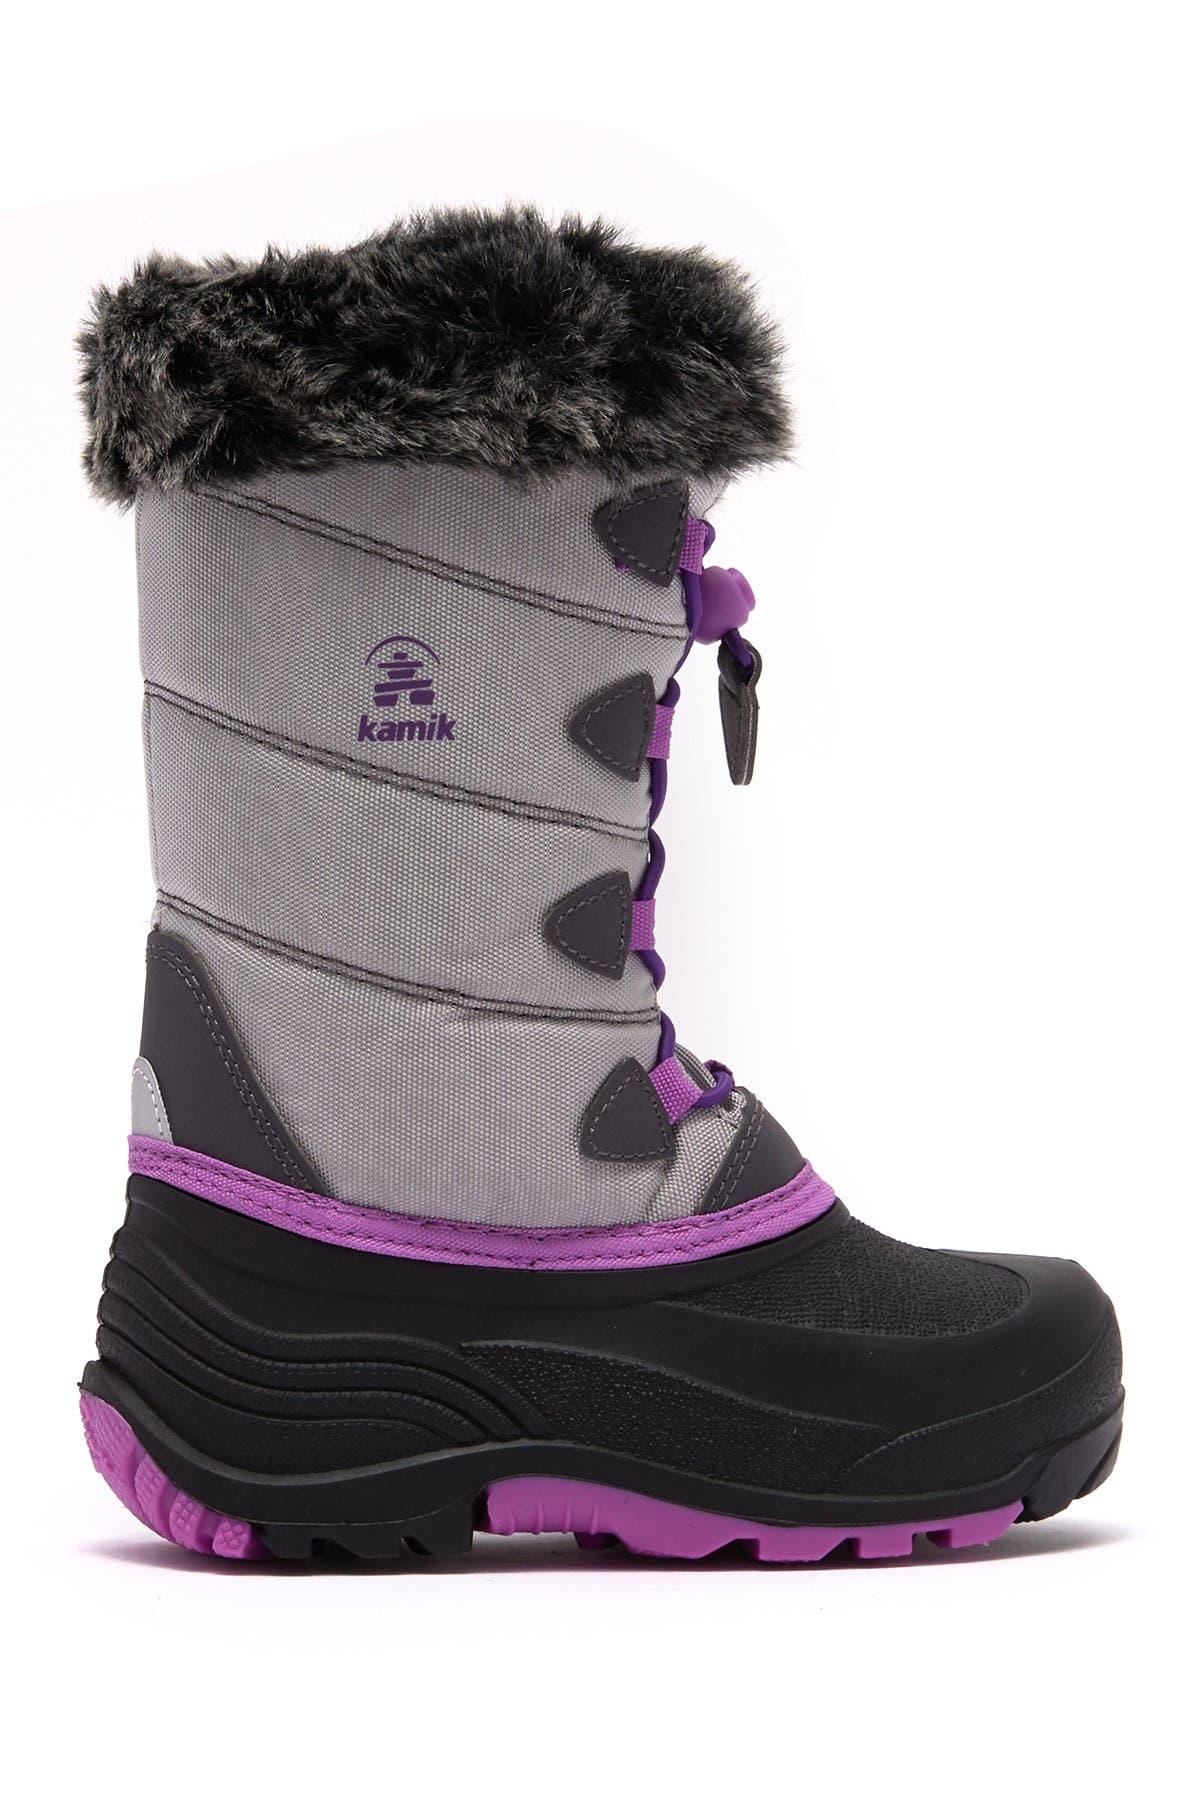 Kamik SnowGypsy3 Waterproof Faux Fur Trim Boot